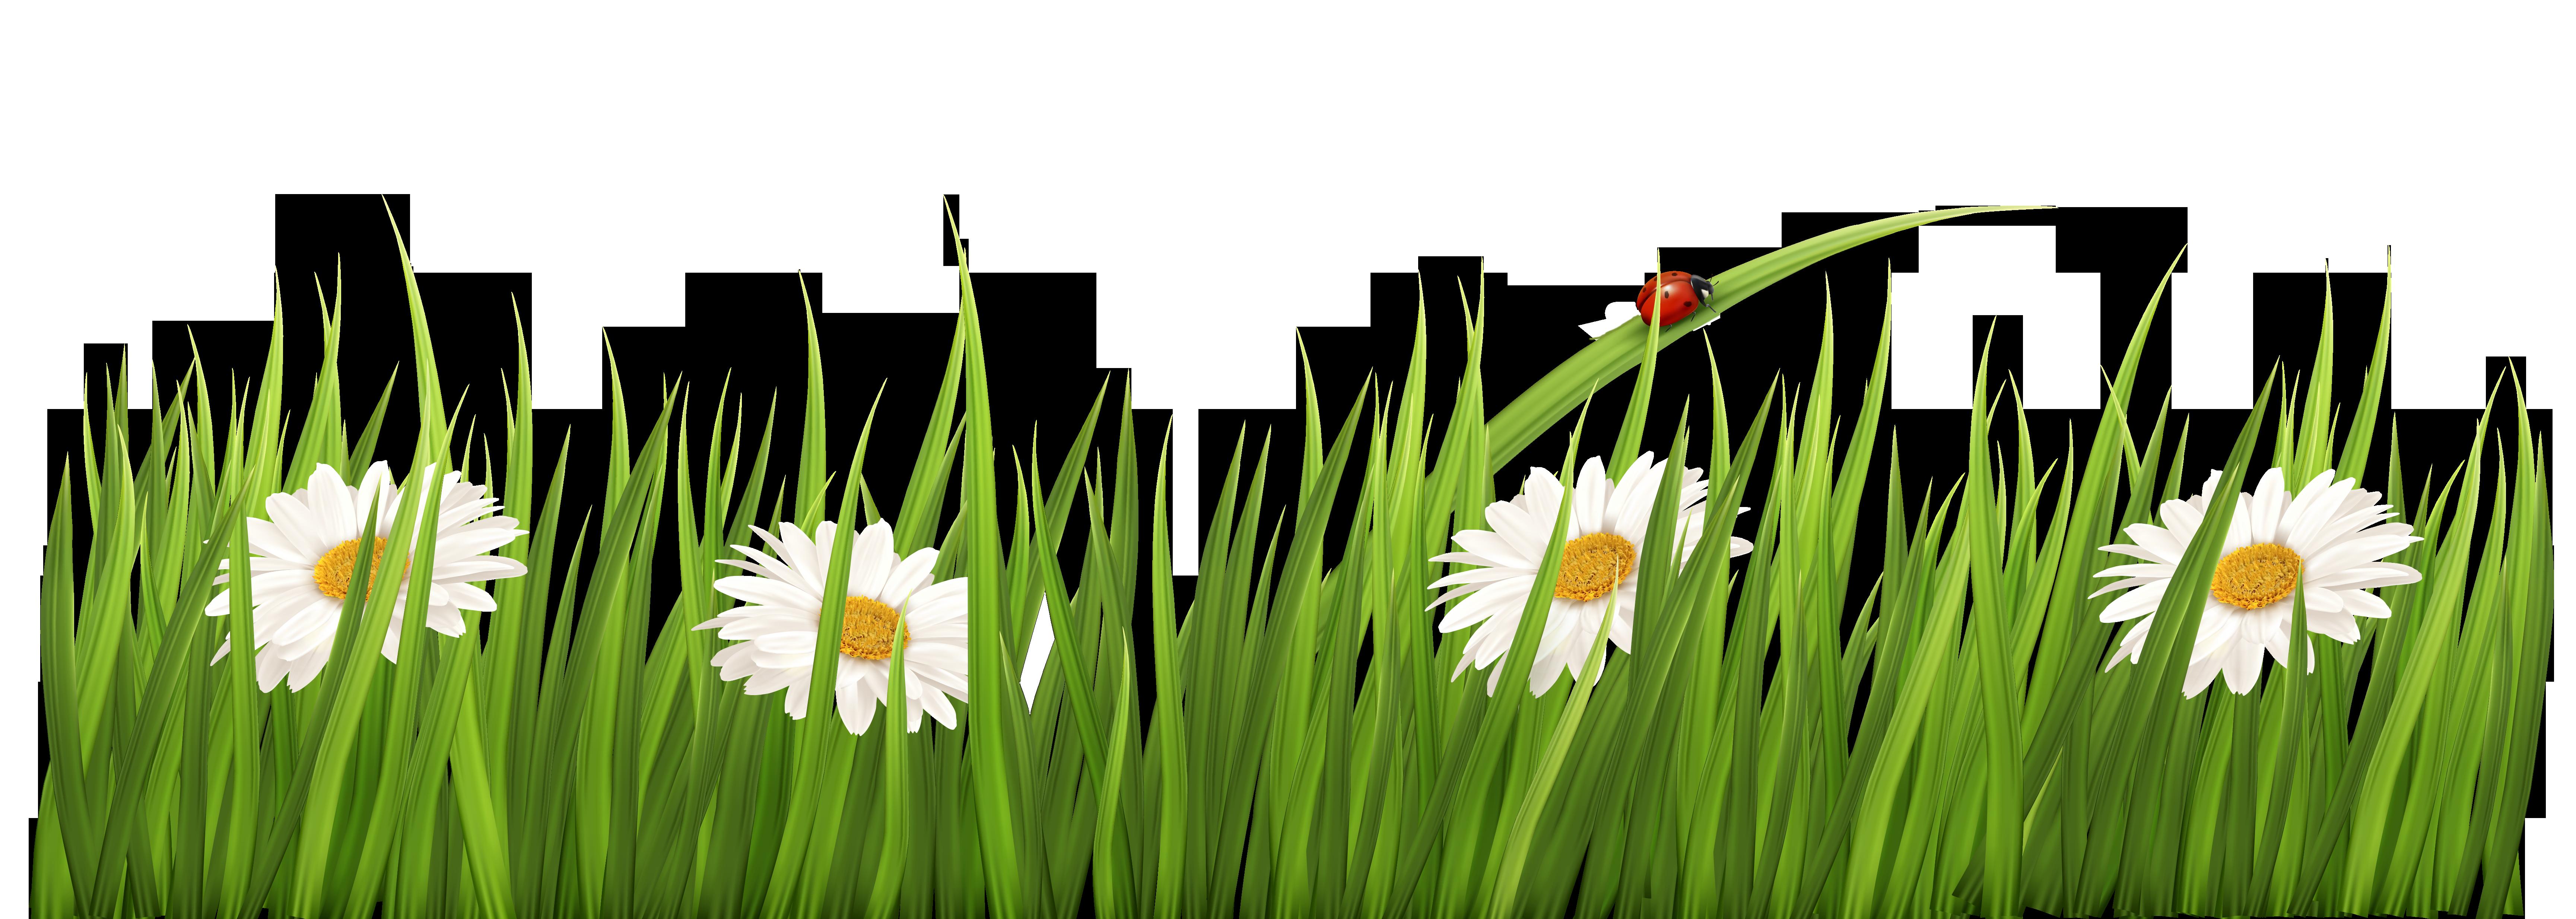 White flower clipart transparent background jpg freeuse White Flowers with Grass Transparent PNG Clipart jpg freeuse